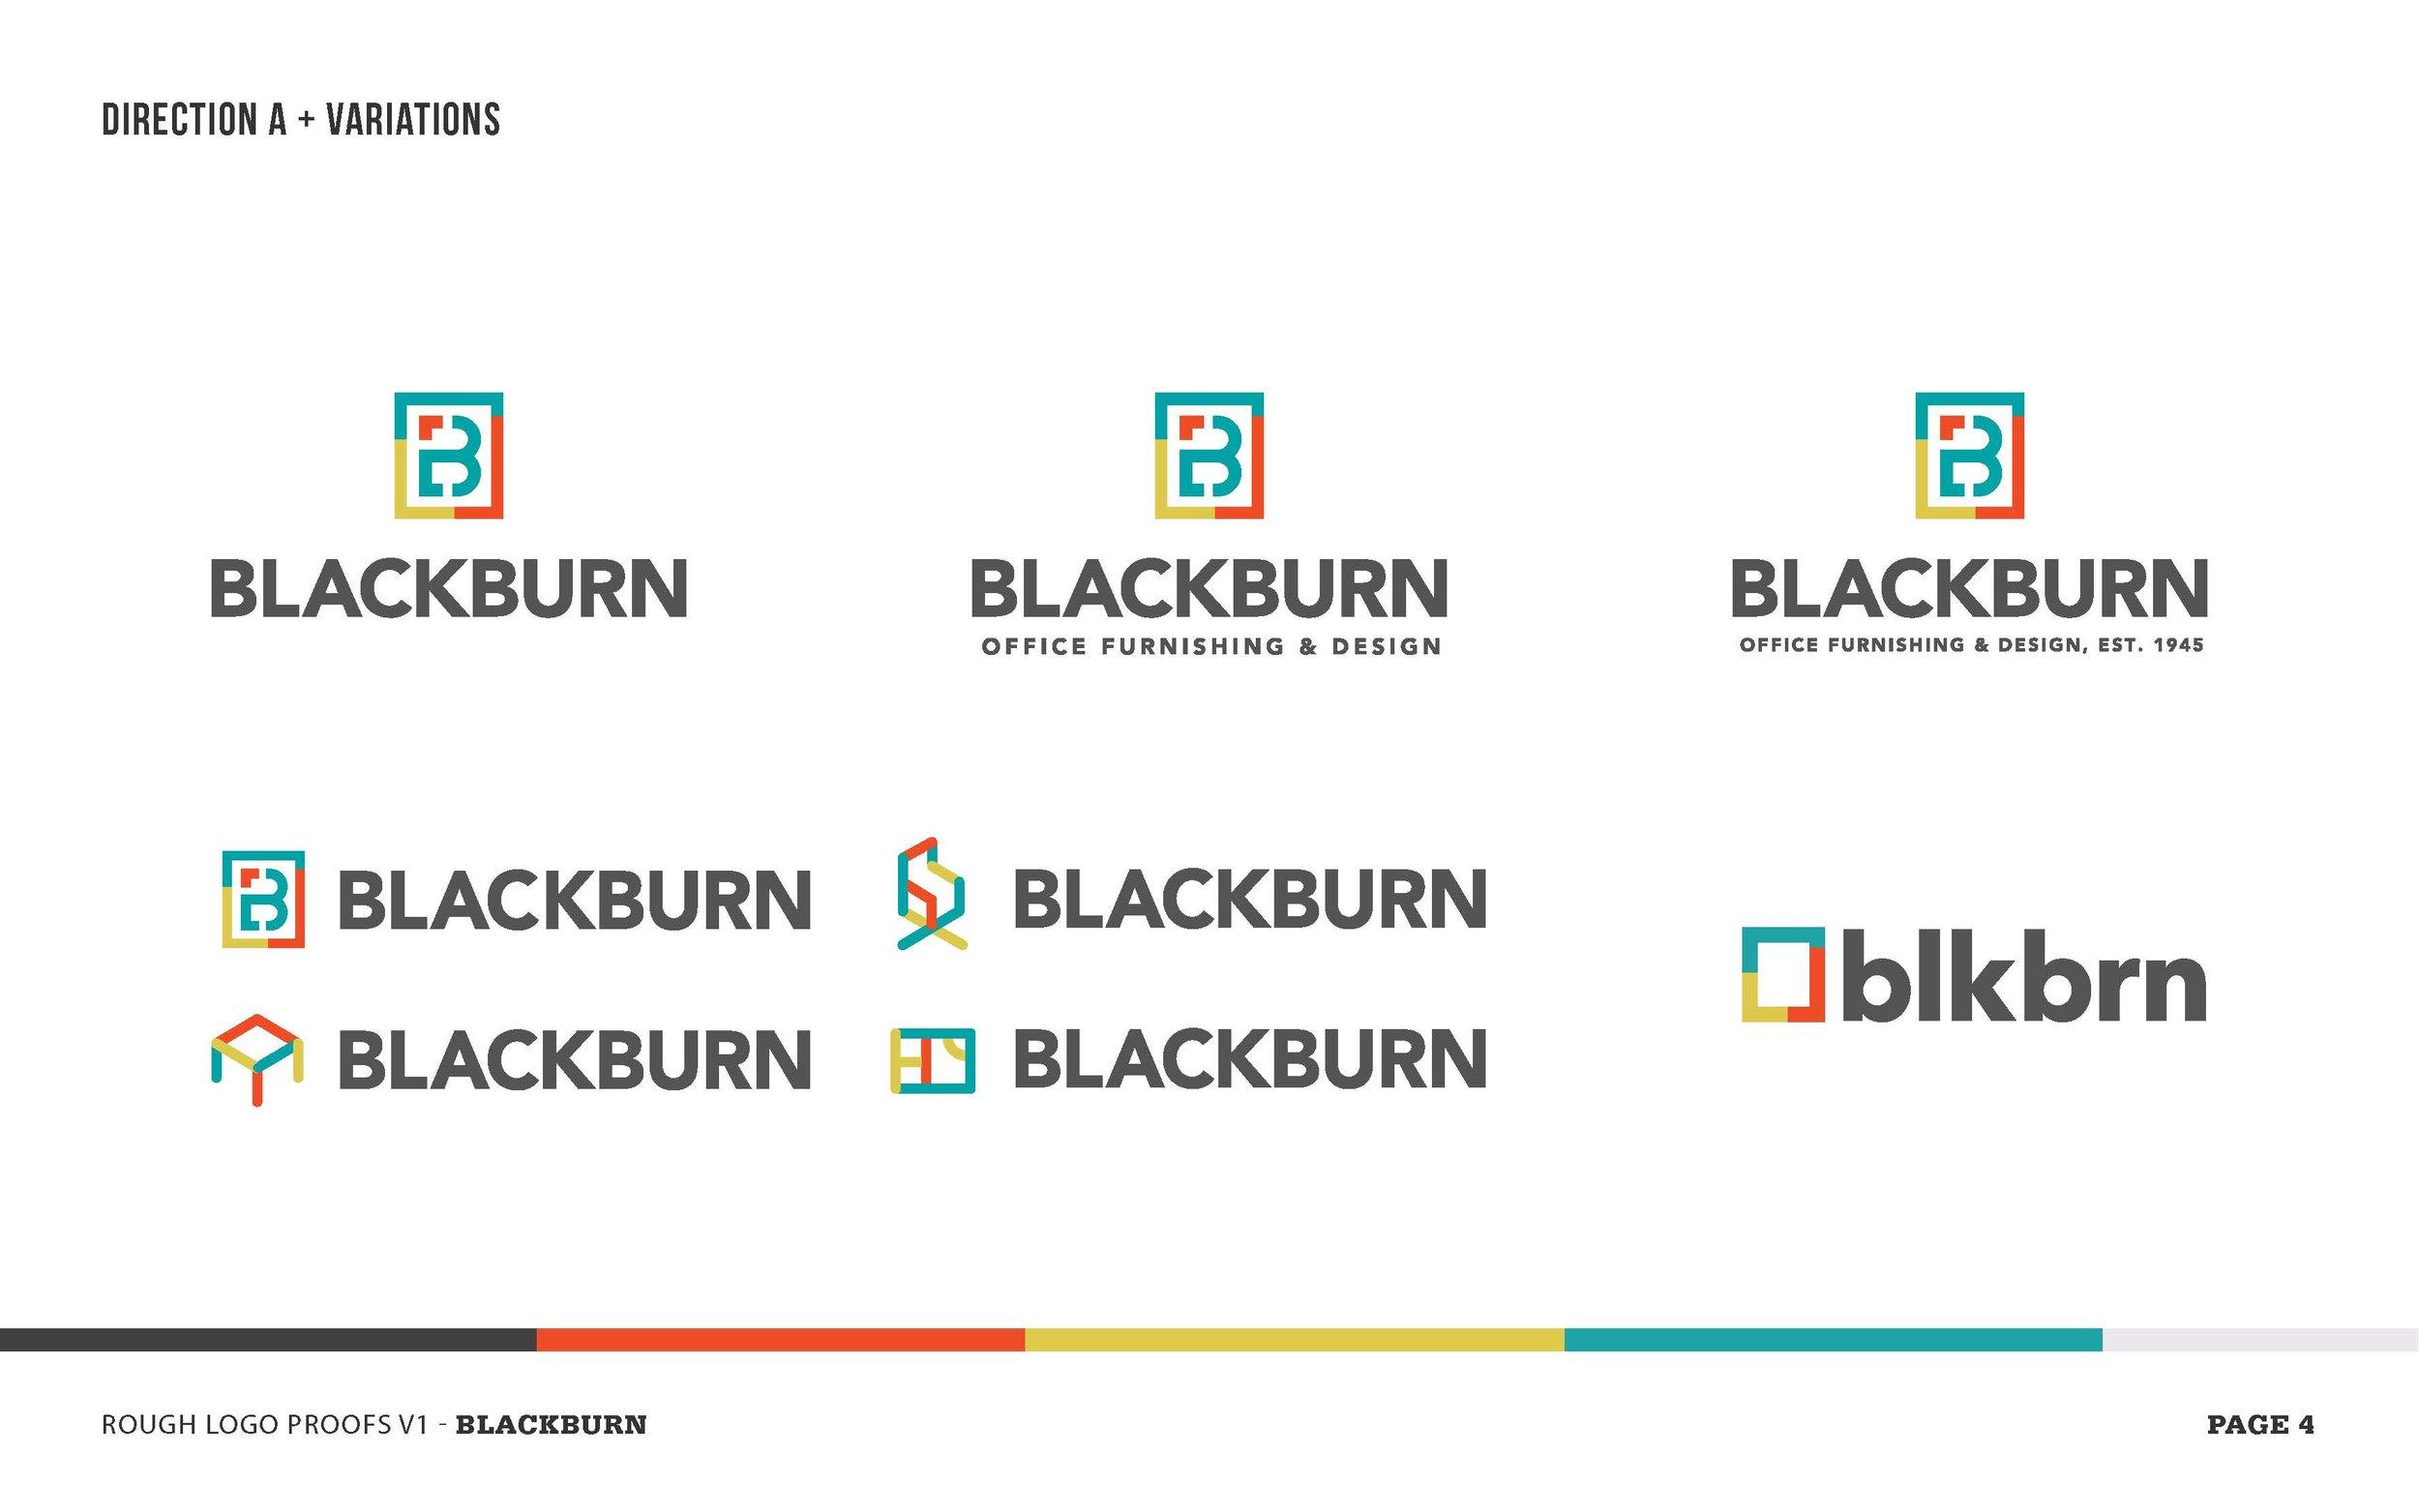 blkbrn-logo-rough-presentation-v1-max_Page_4.jpg